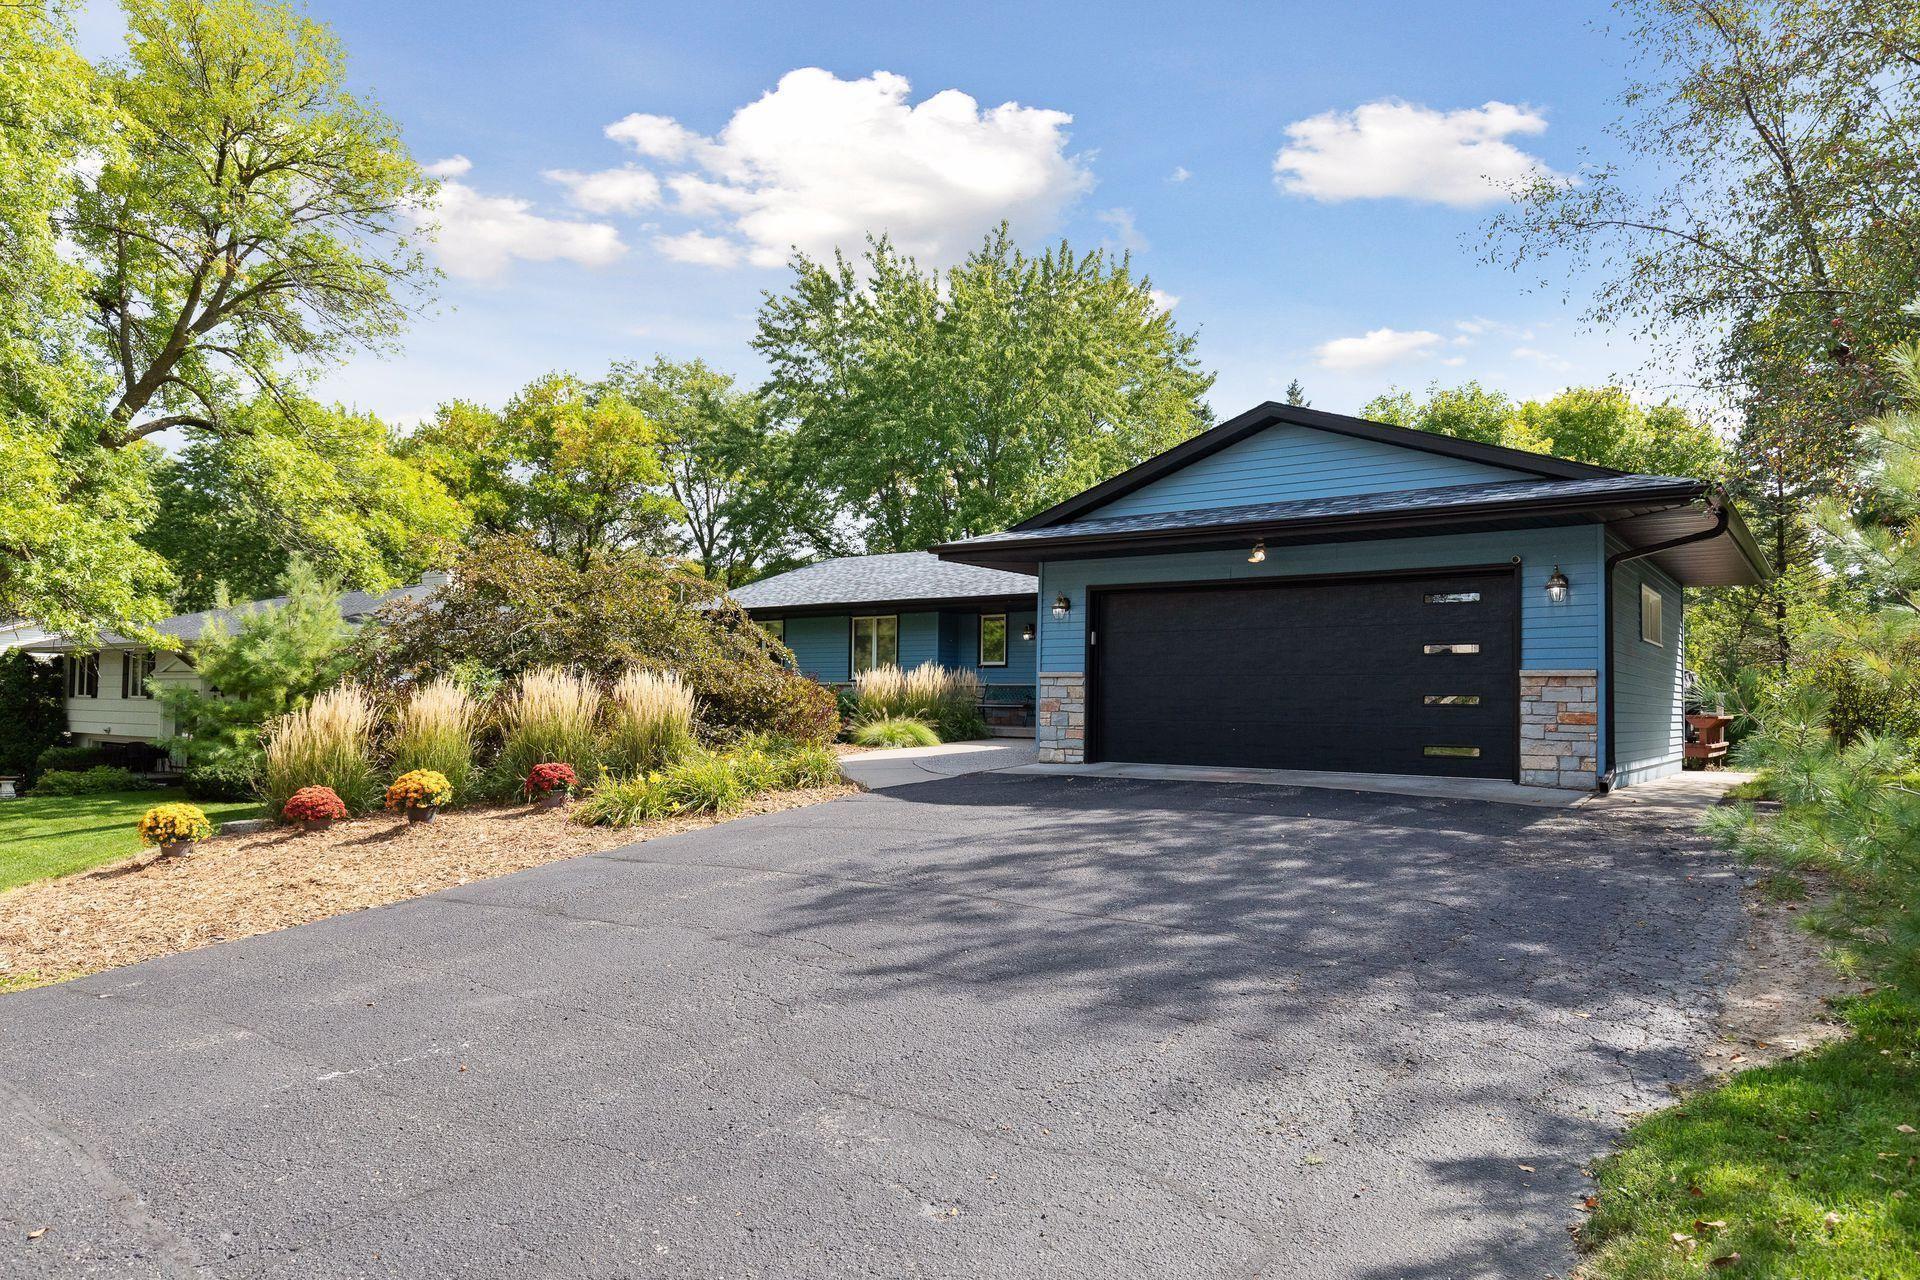 Photo of 5809 Merold Drive, Edina, MN 55436 (MLS # 6097595)